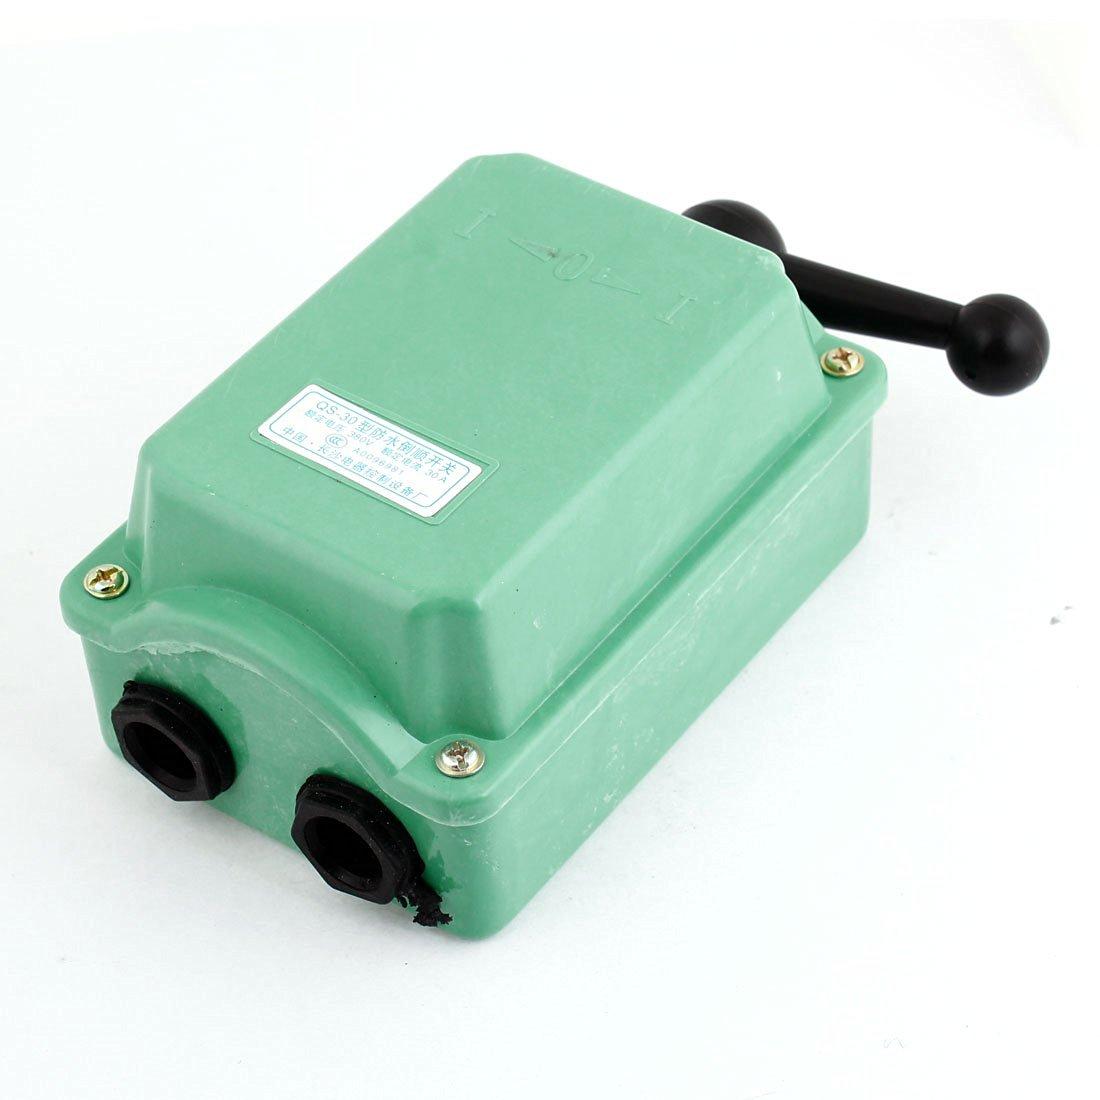 Power Utilities Drum Switch Wiring Switch Wiring Forward Position